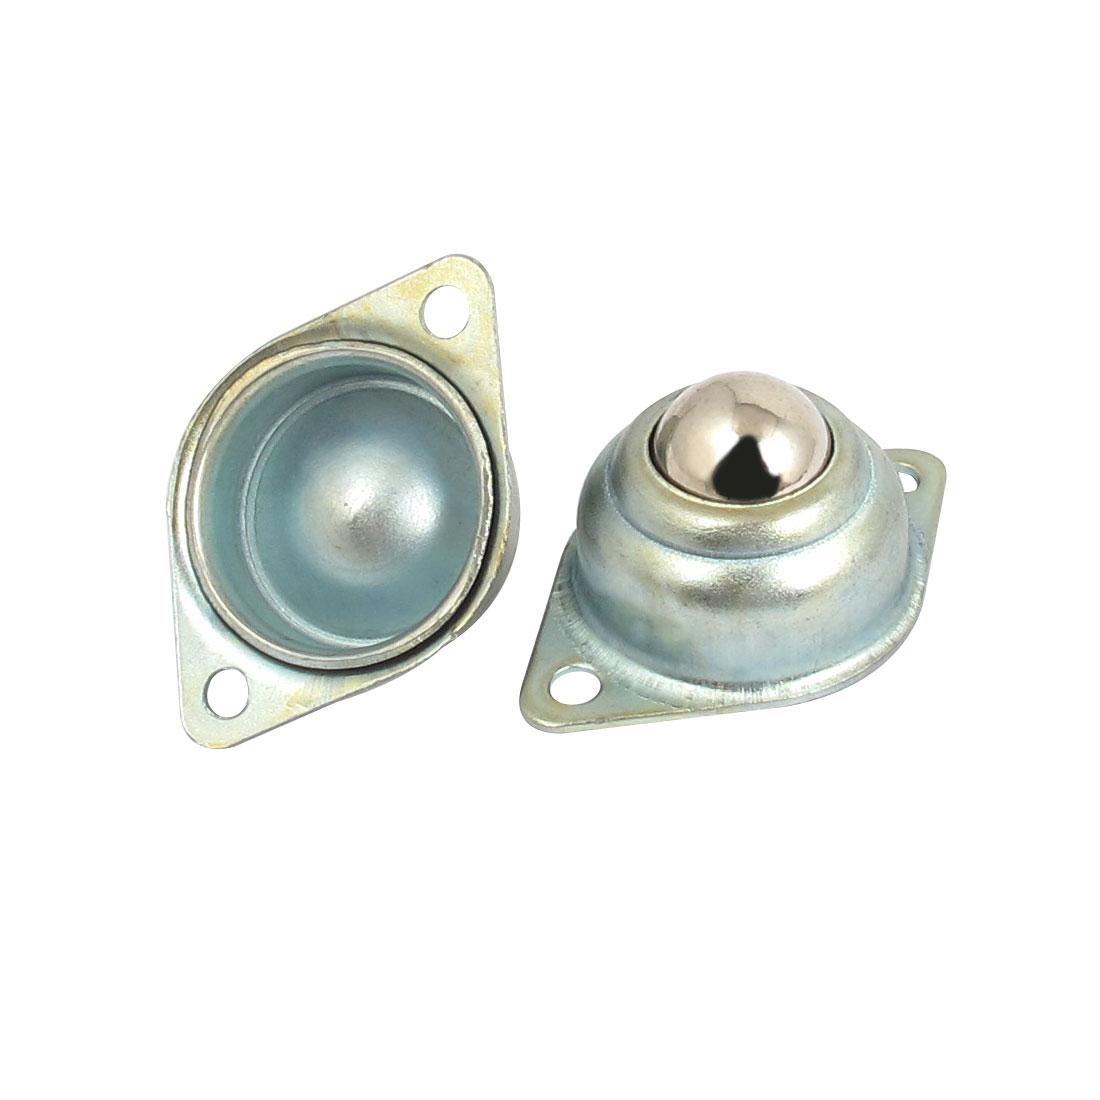 2pcs Silver Tone Metal Eye Shape 2 Holes Flange Mounting Roller Ball Transfer Unit Bearing